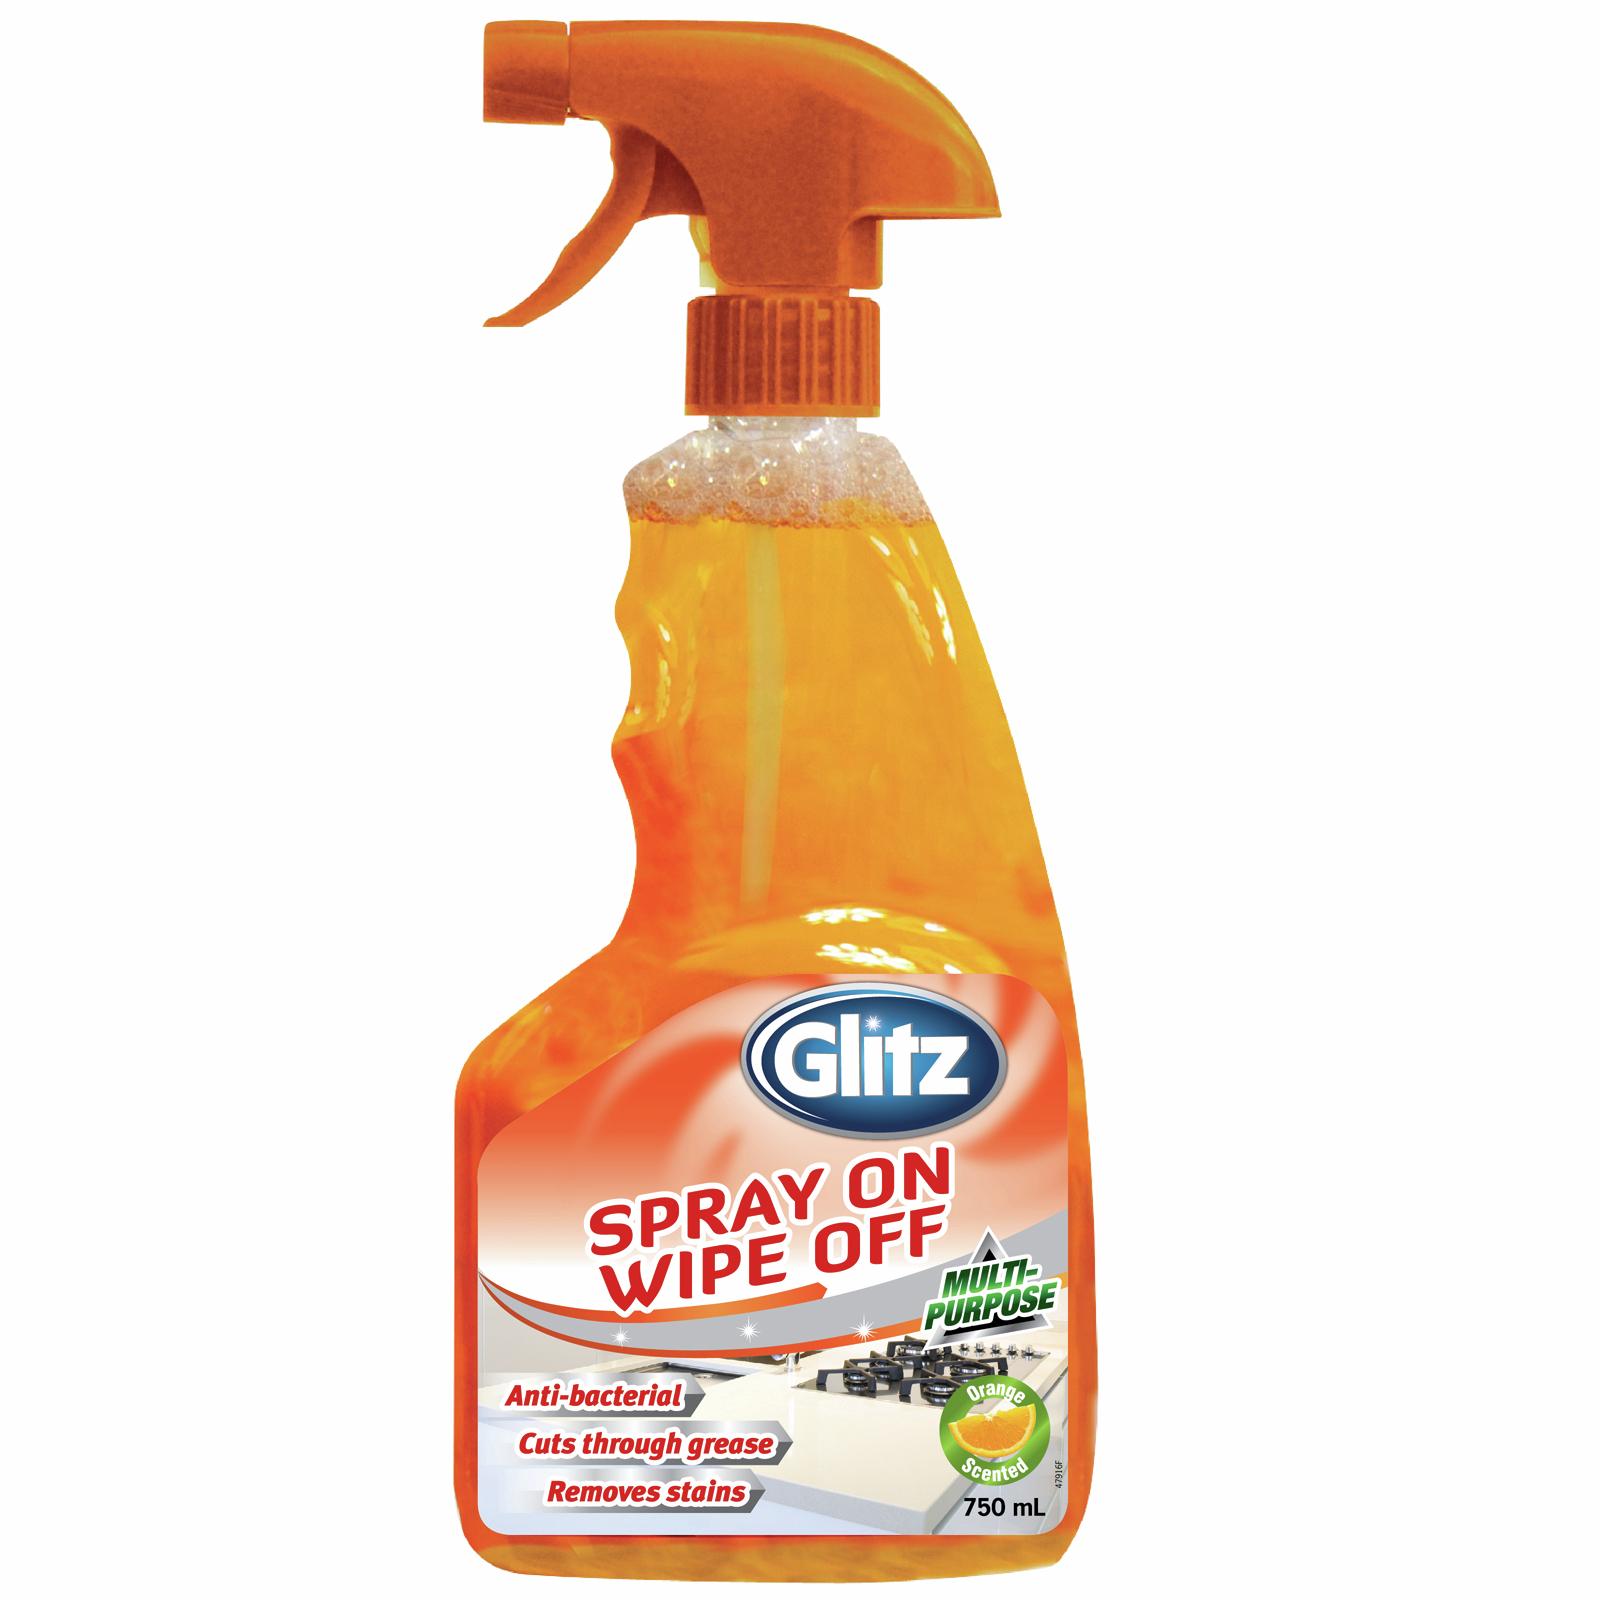 Glitz 750ml Spray On Wipe Off